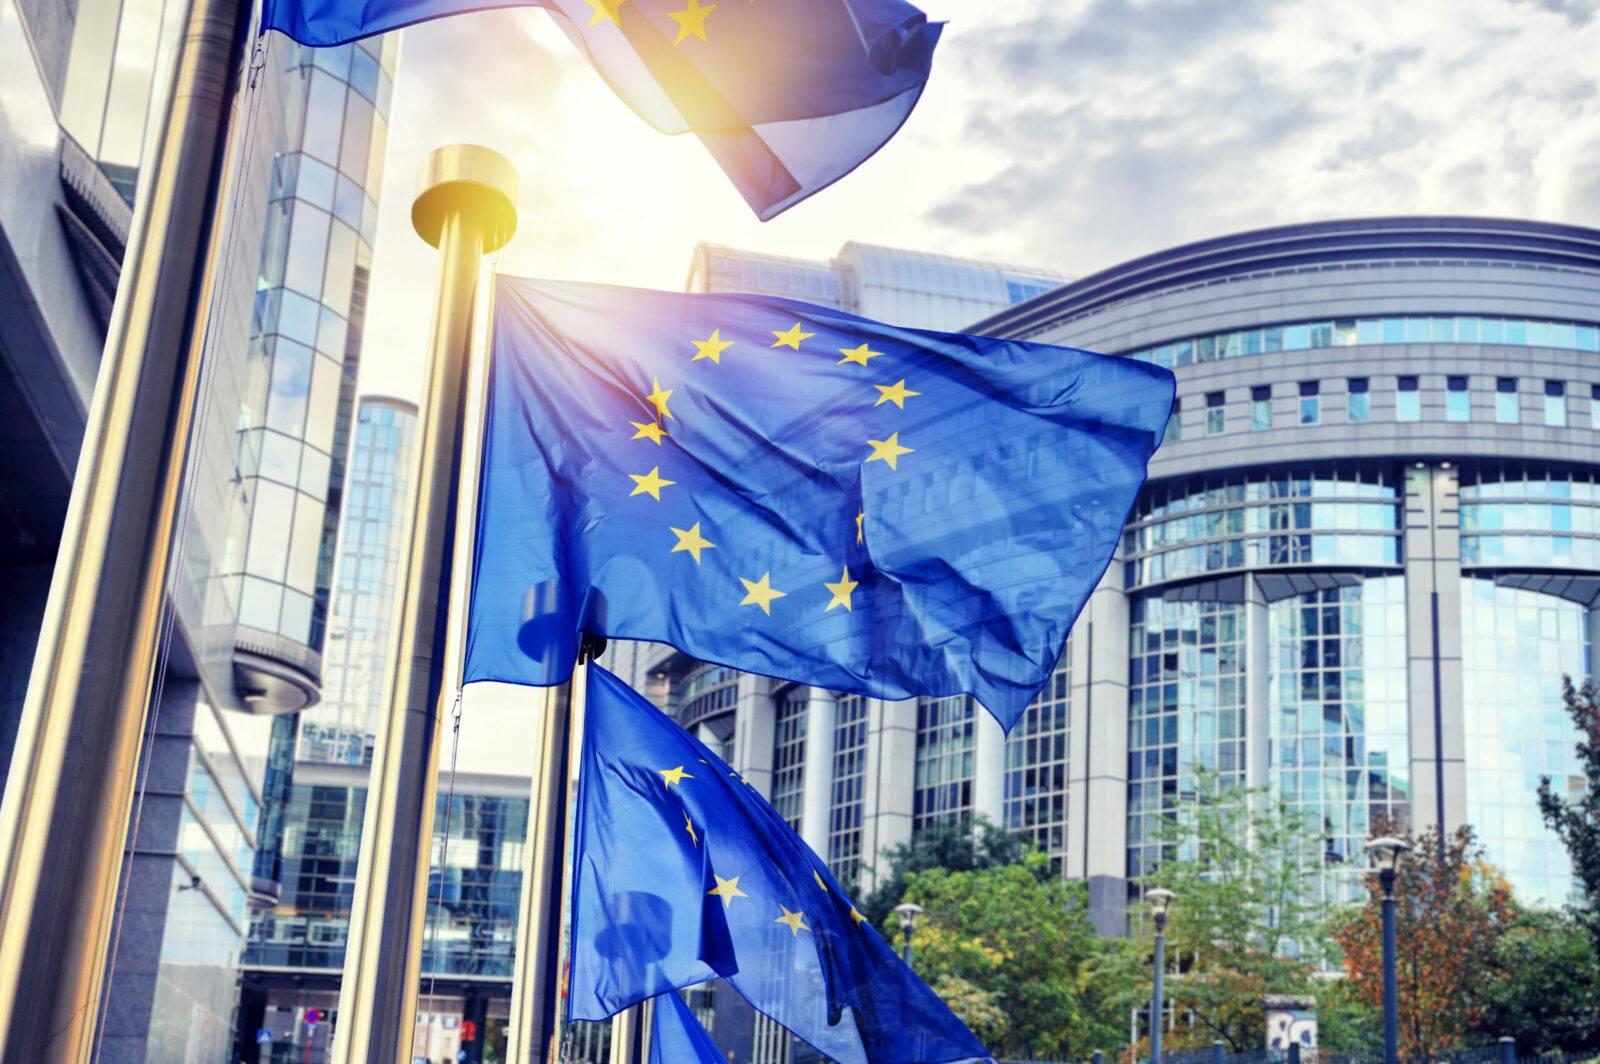 Adoption of (EU) Regulation No. 2020/1784 on the service of documents